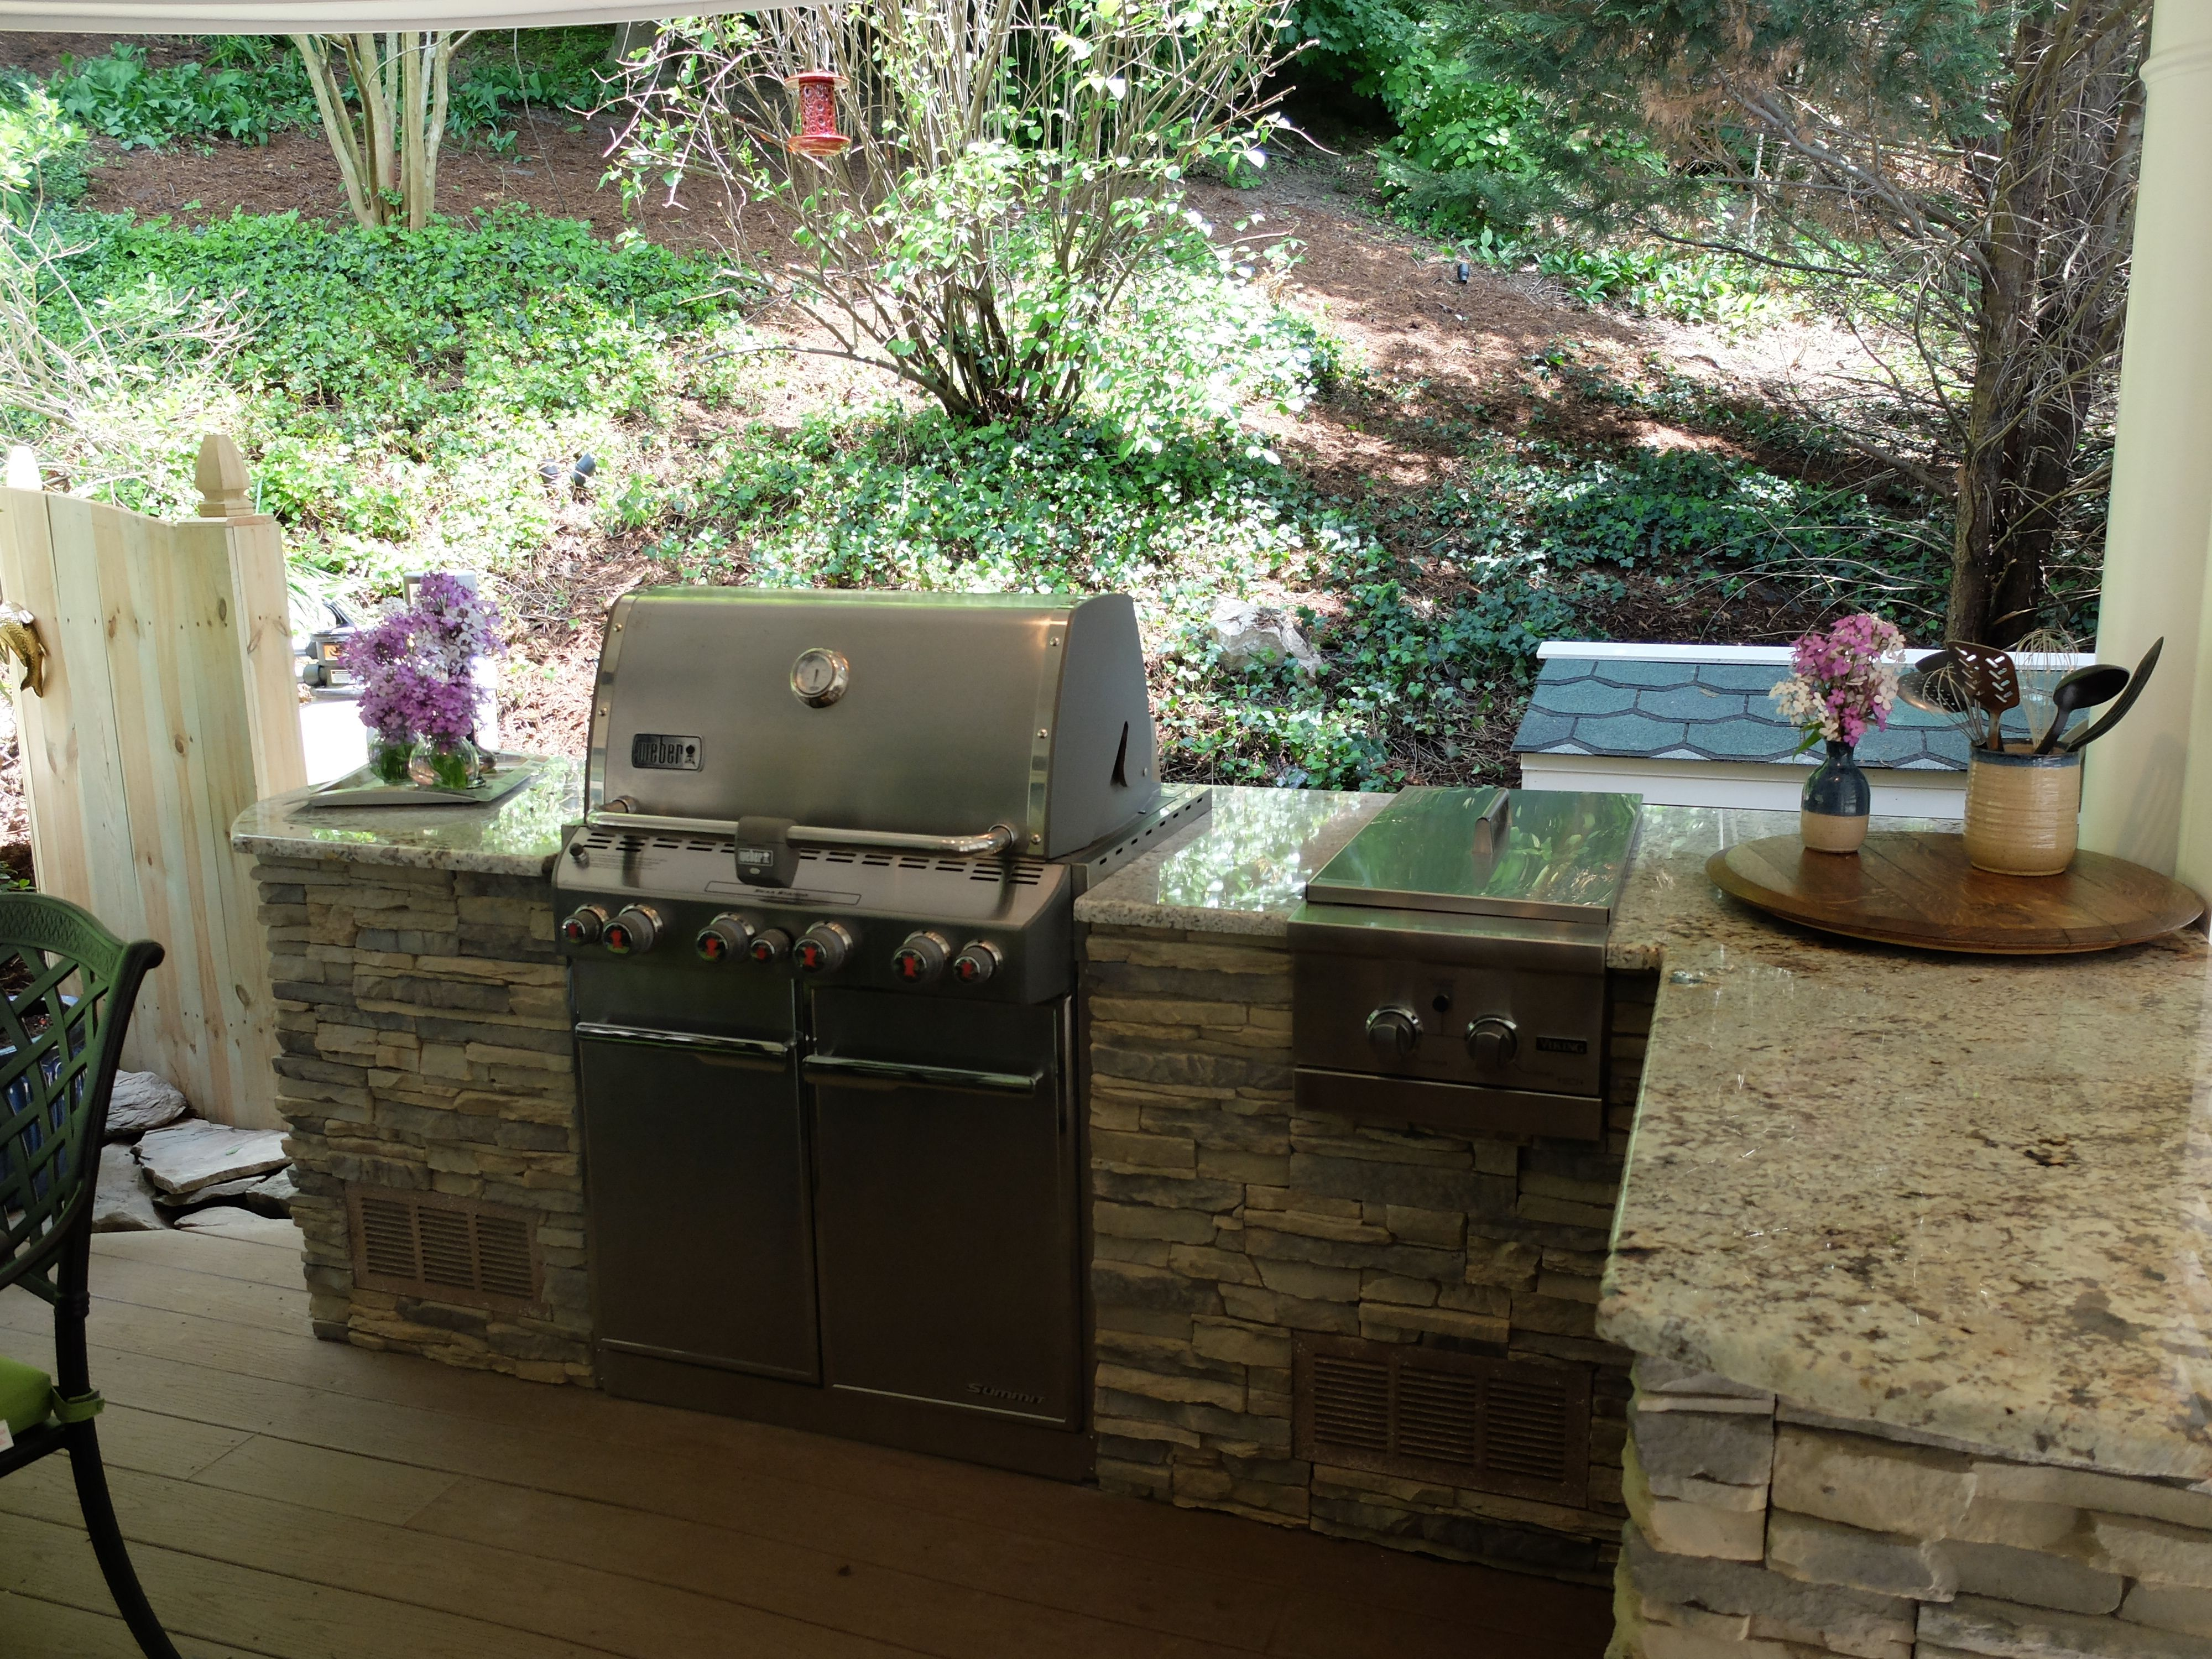 Eldorado Outdoor Kitchen Weber Kettle Grill Mounted In Outdoor Kitchen Google Search